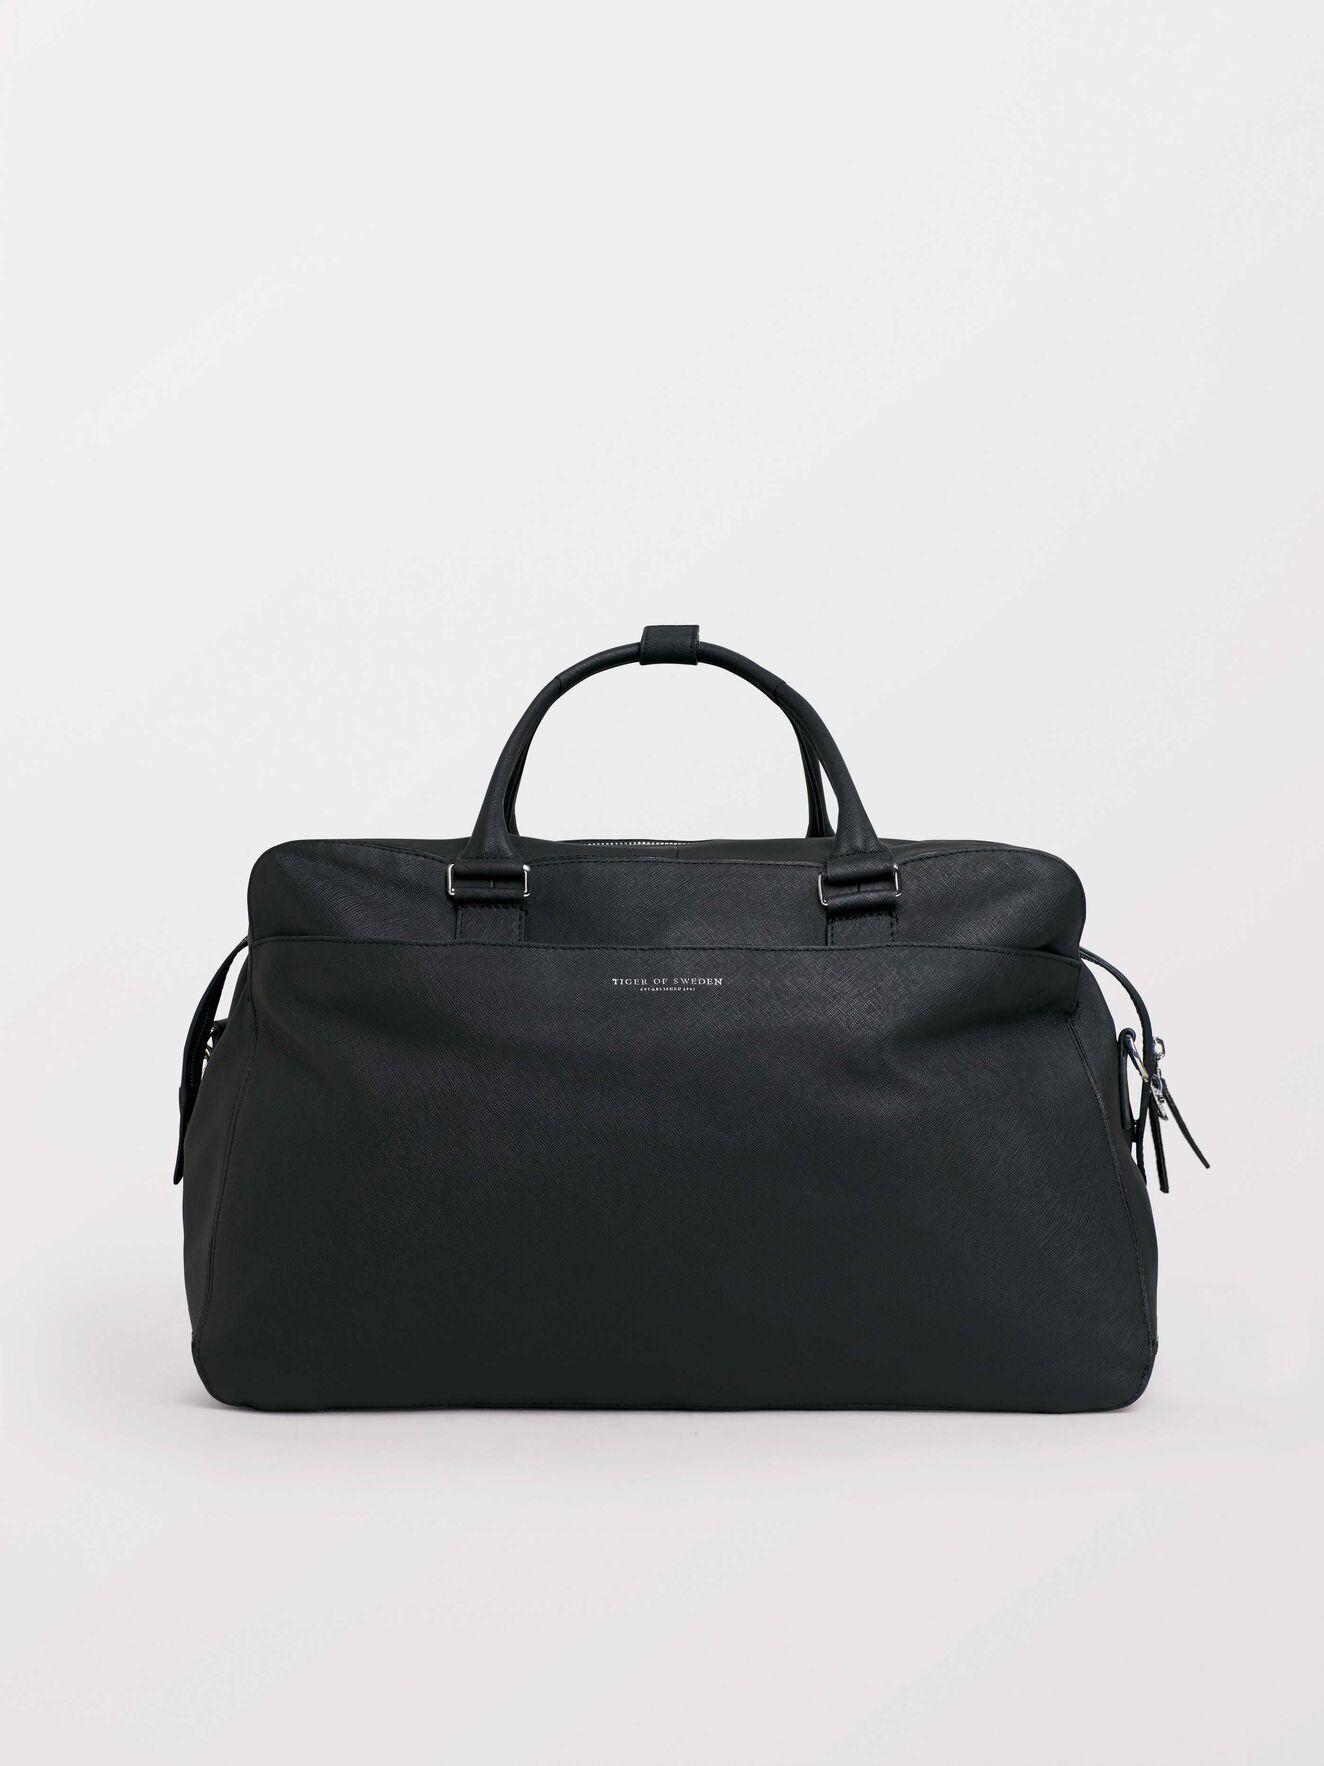 Micke Bag in Black from Tiger of Sweden